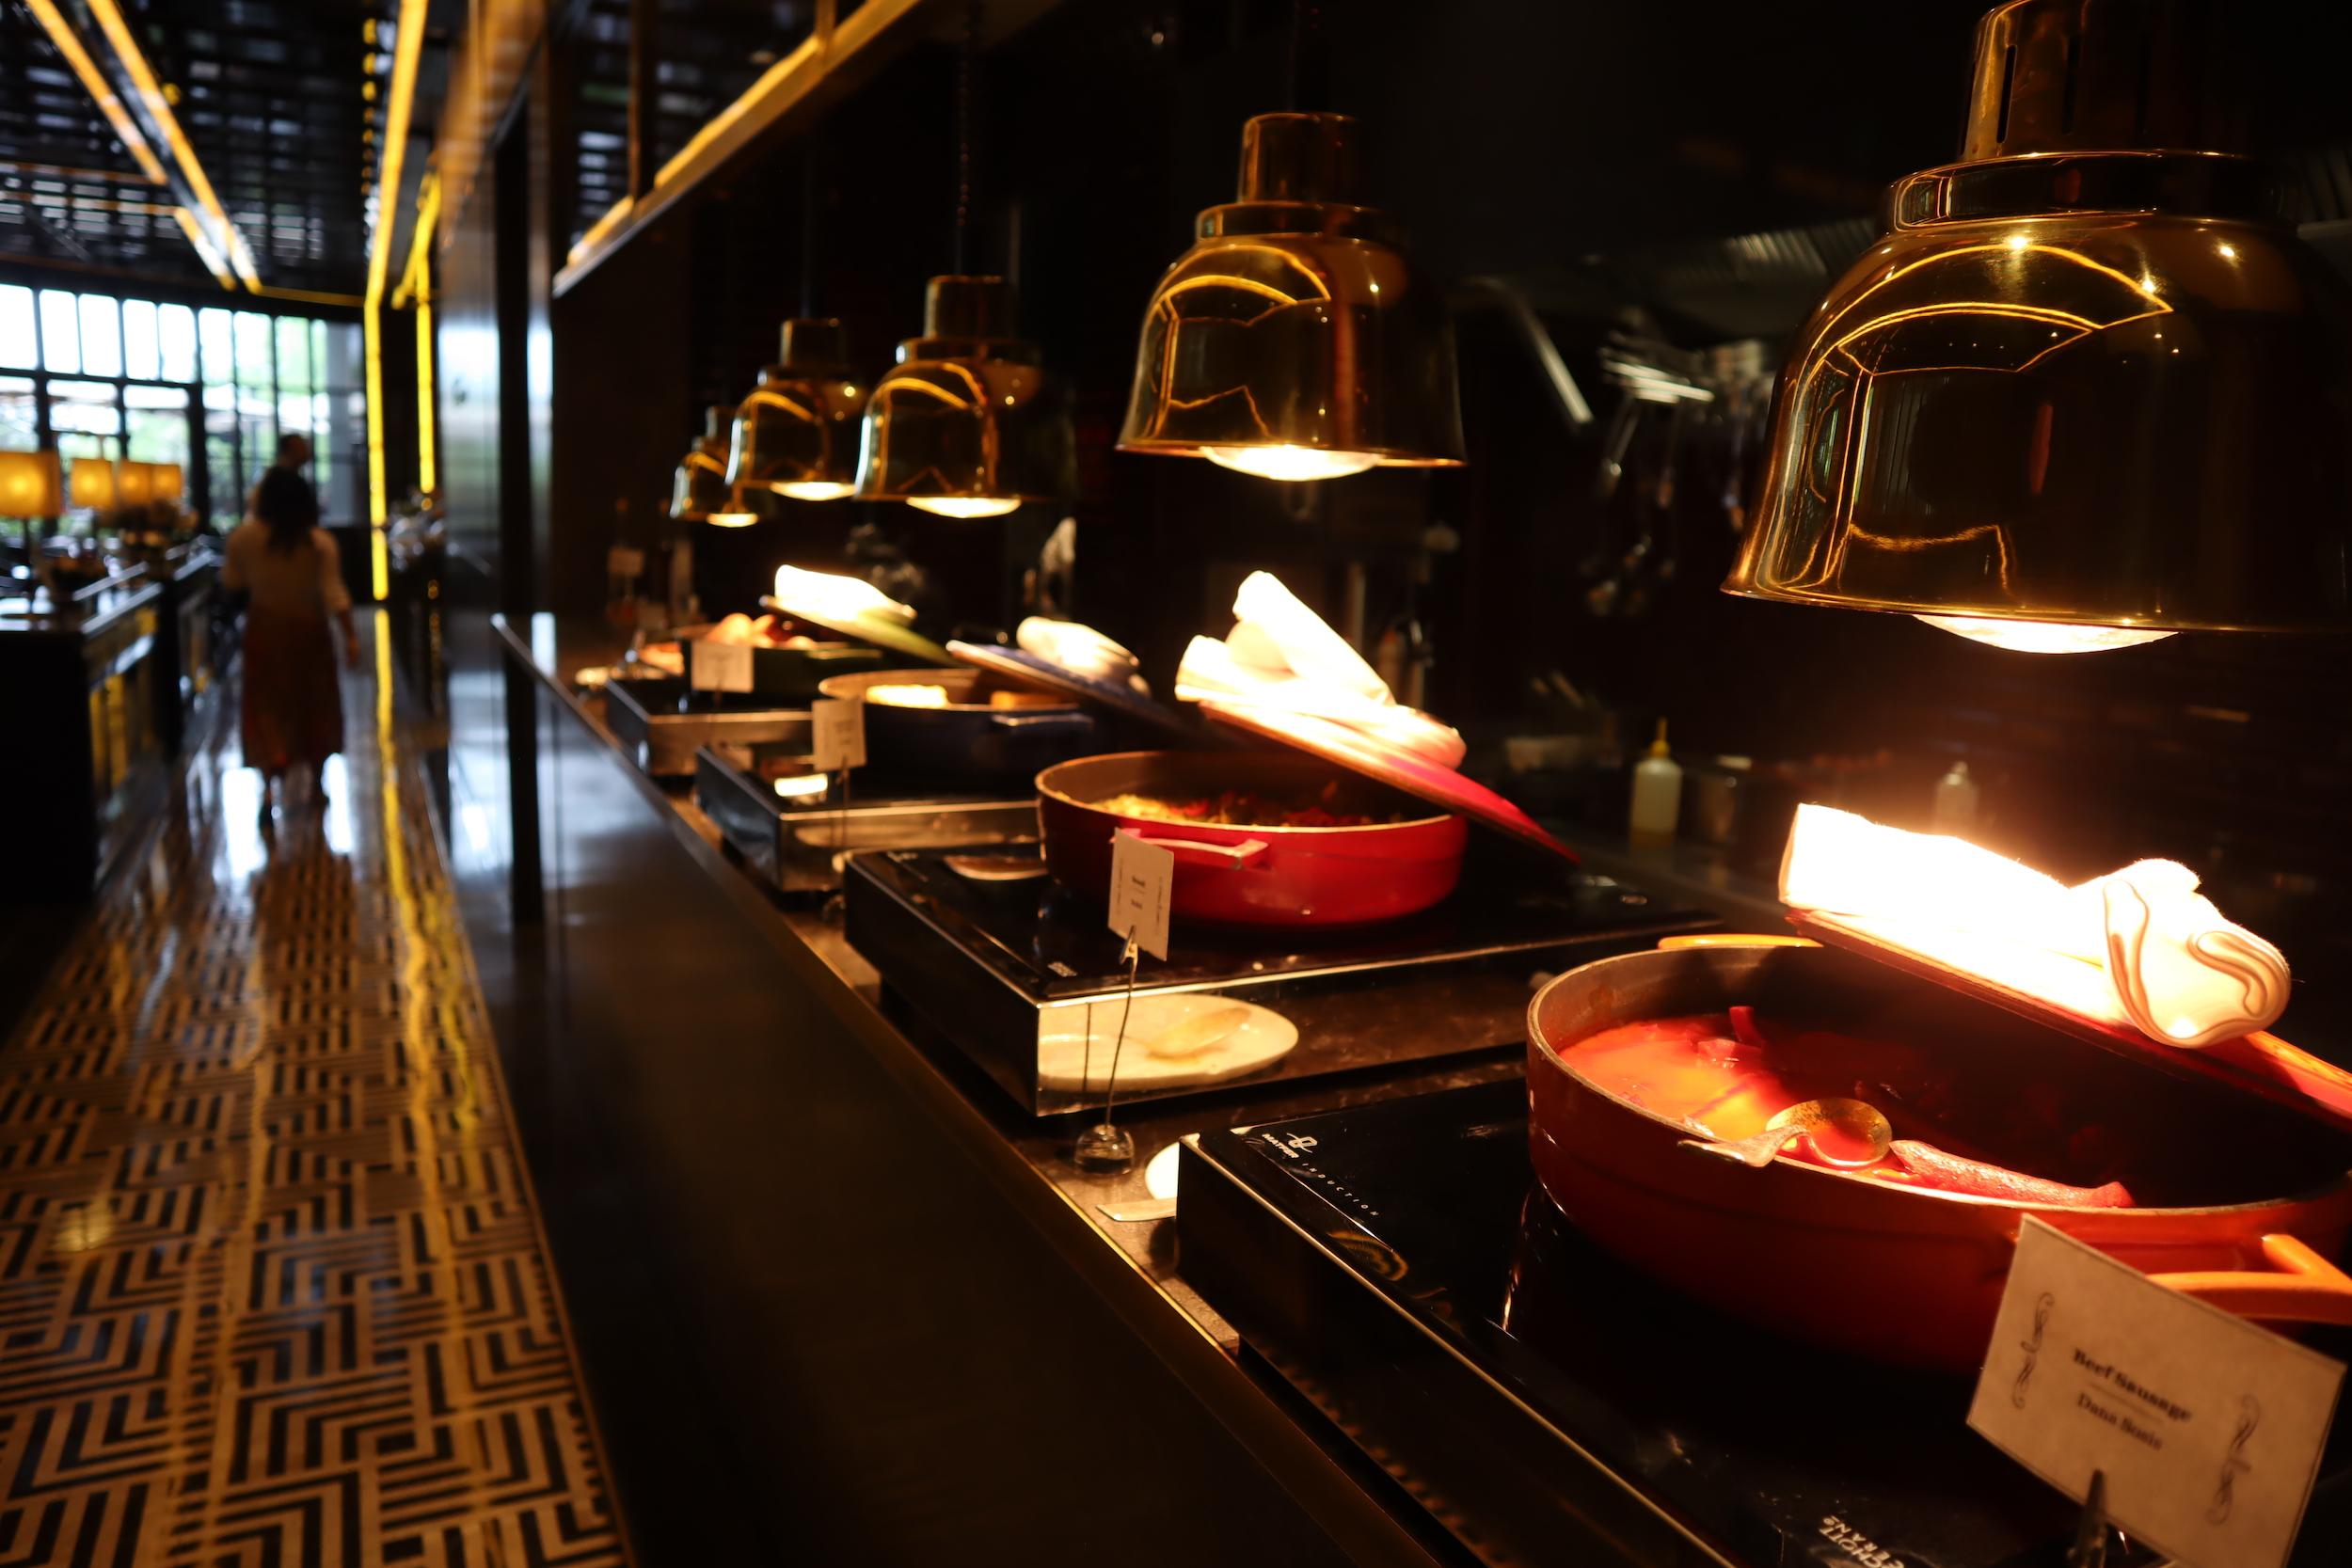 St. Regis Istanbul – Breakfast hot spread